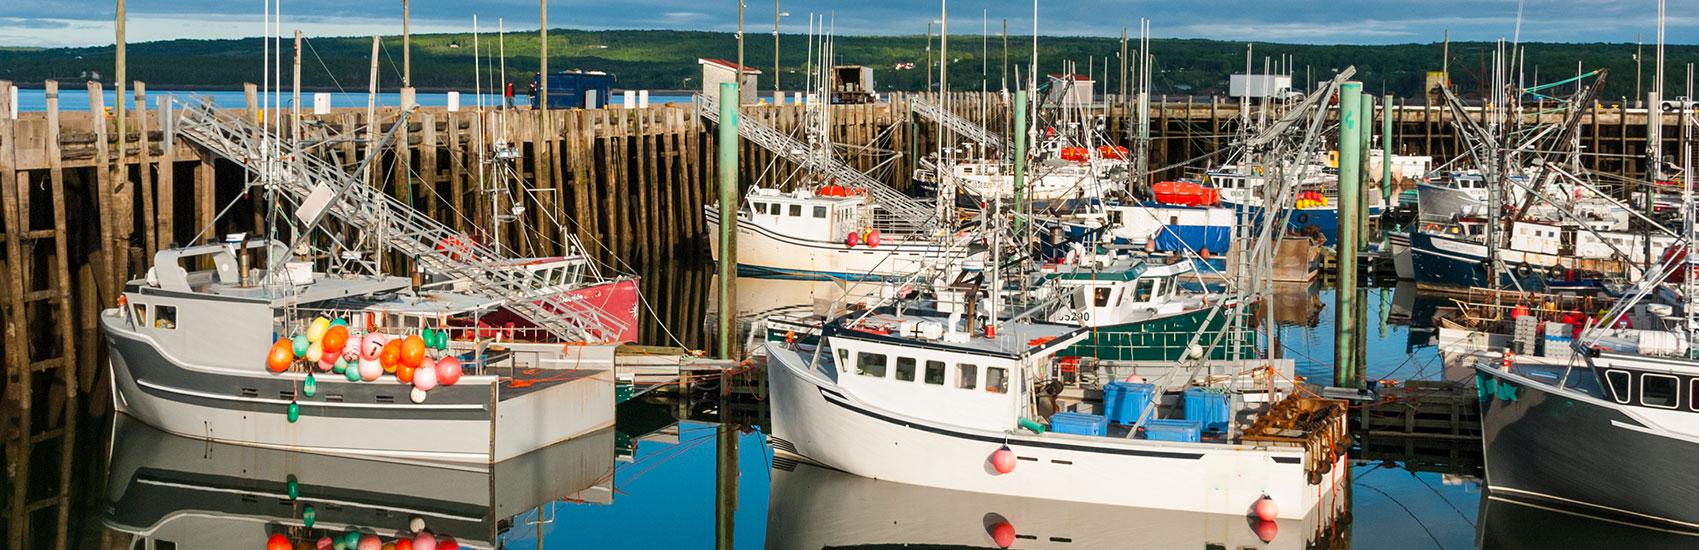 Exclusive Maritime Coastal Wonders Tour 4